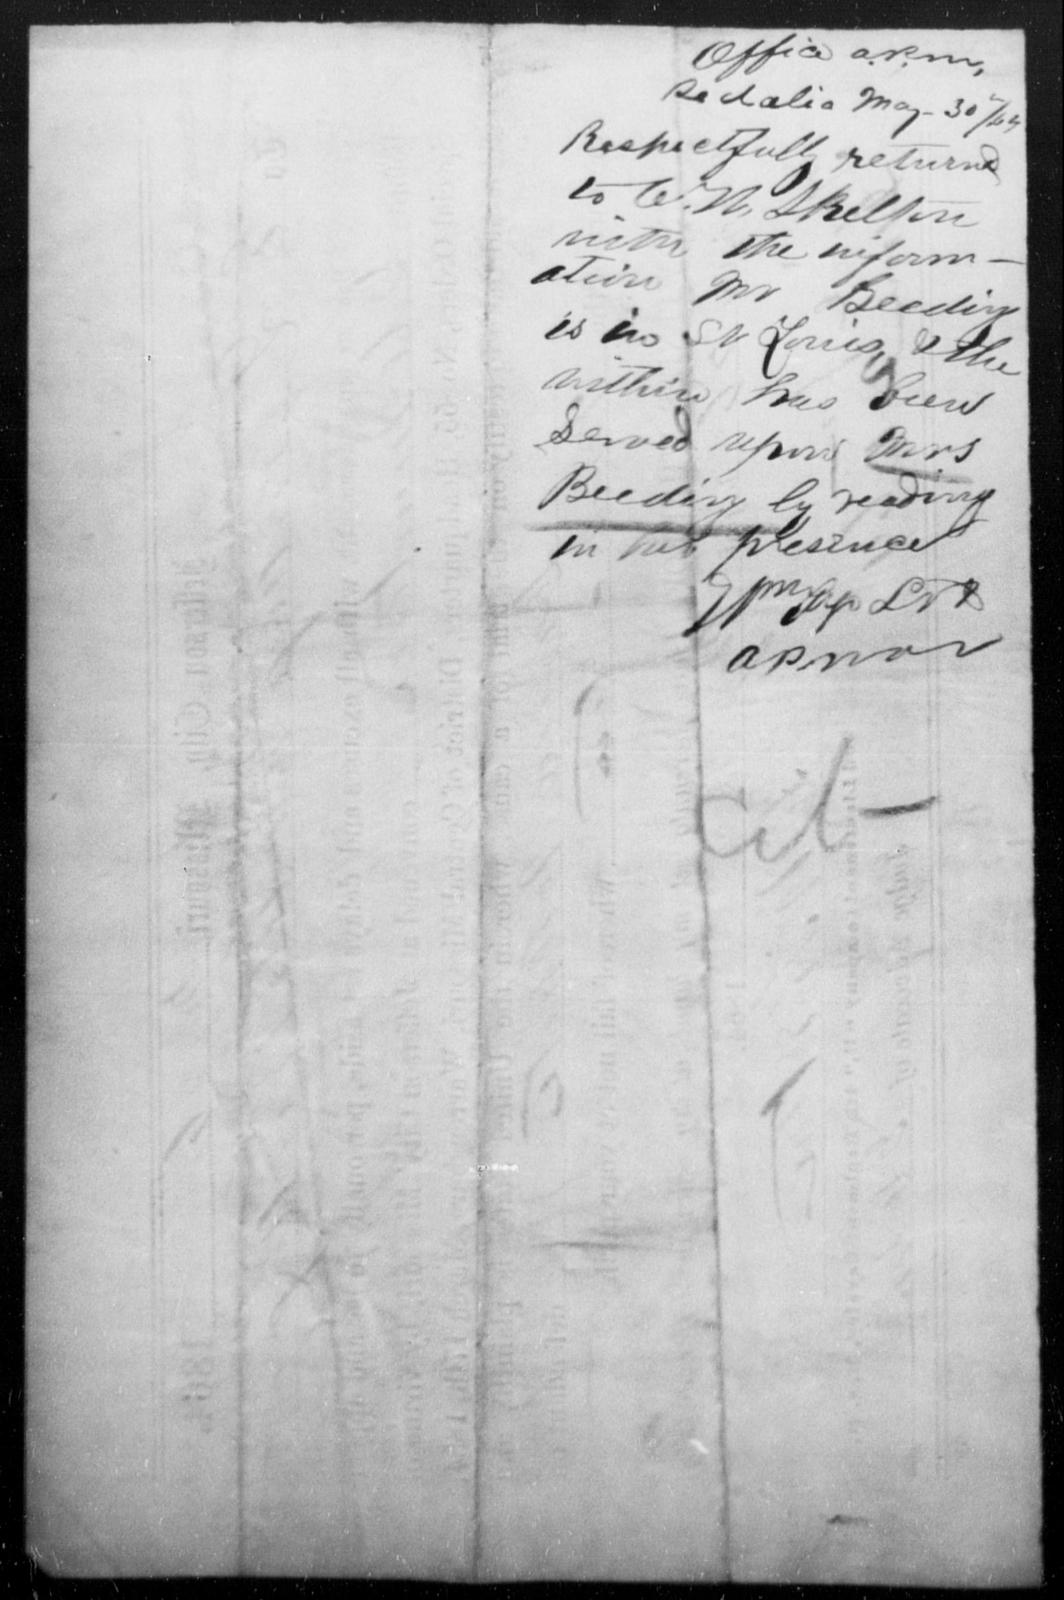 Beeding, [Blank] - State: [Blank] - Year: 1864